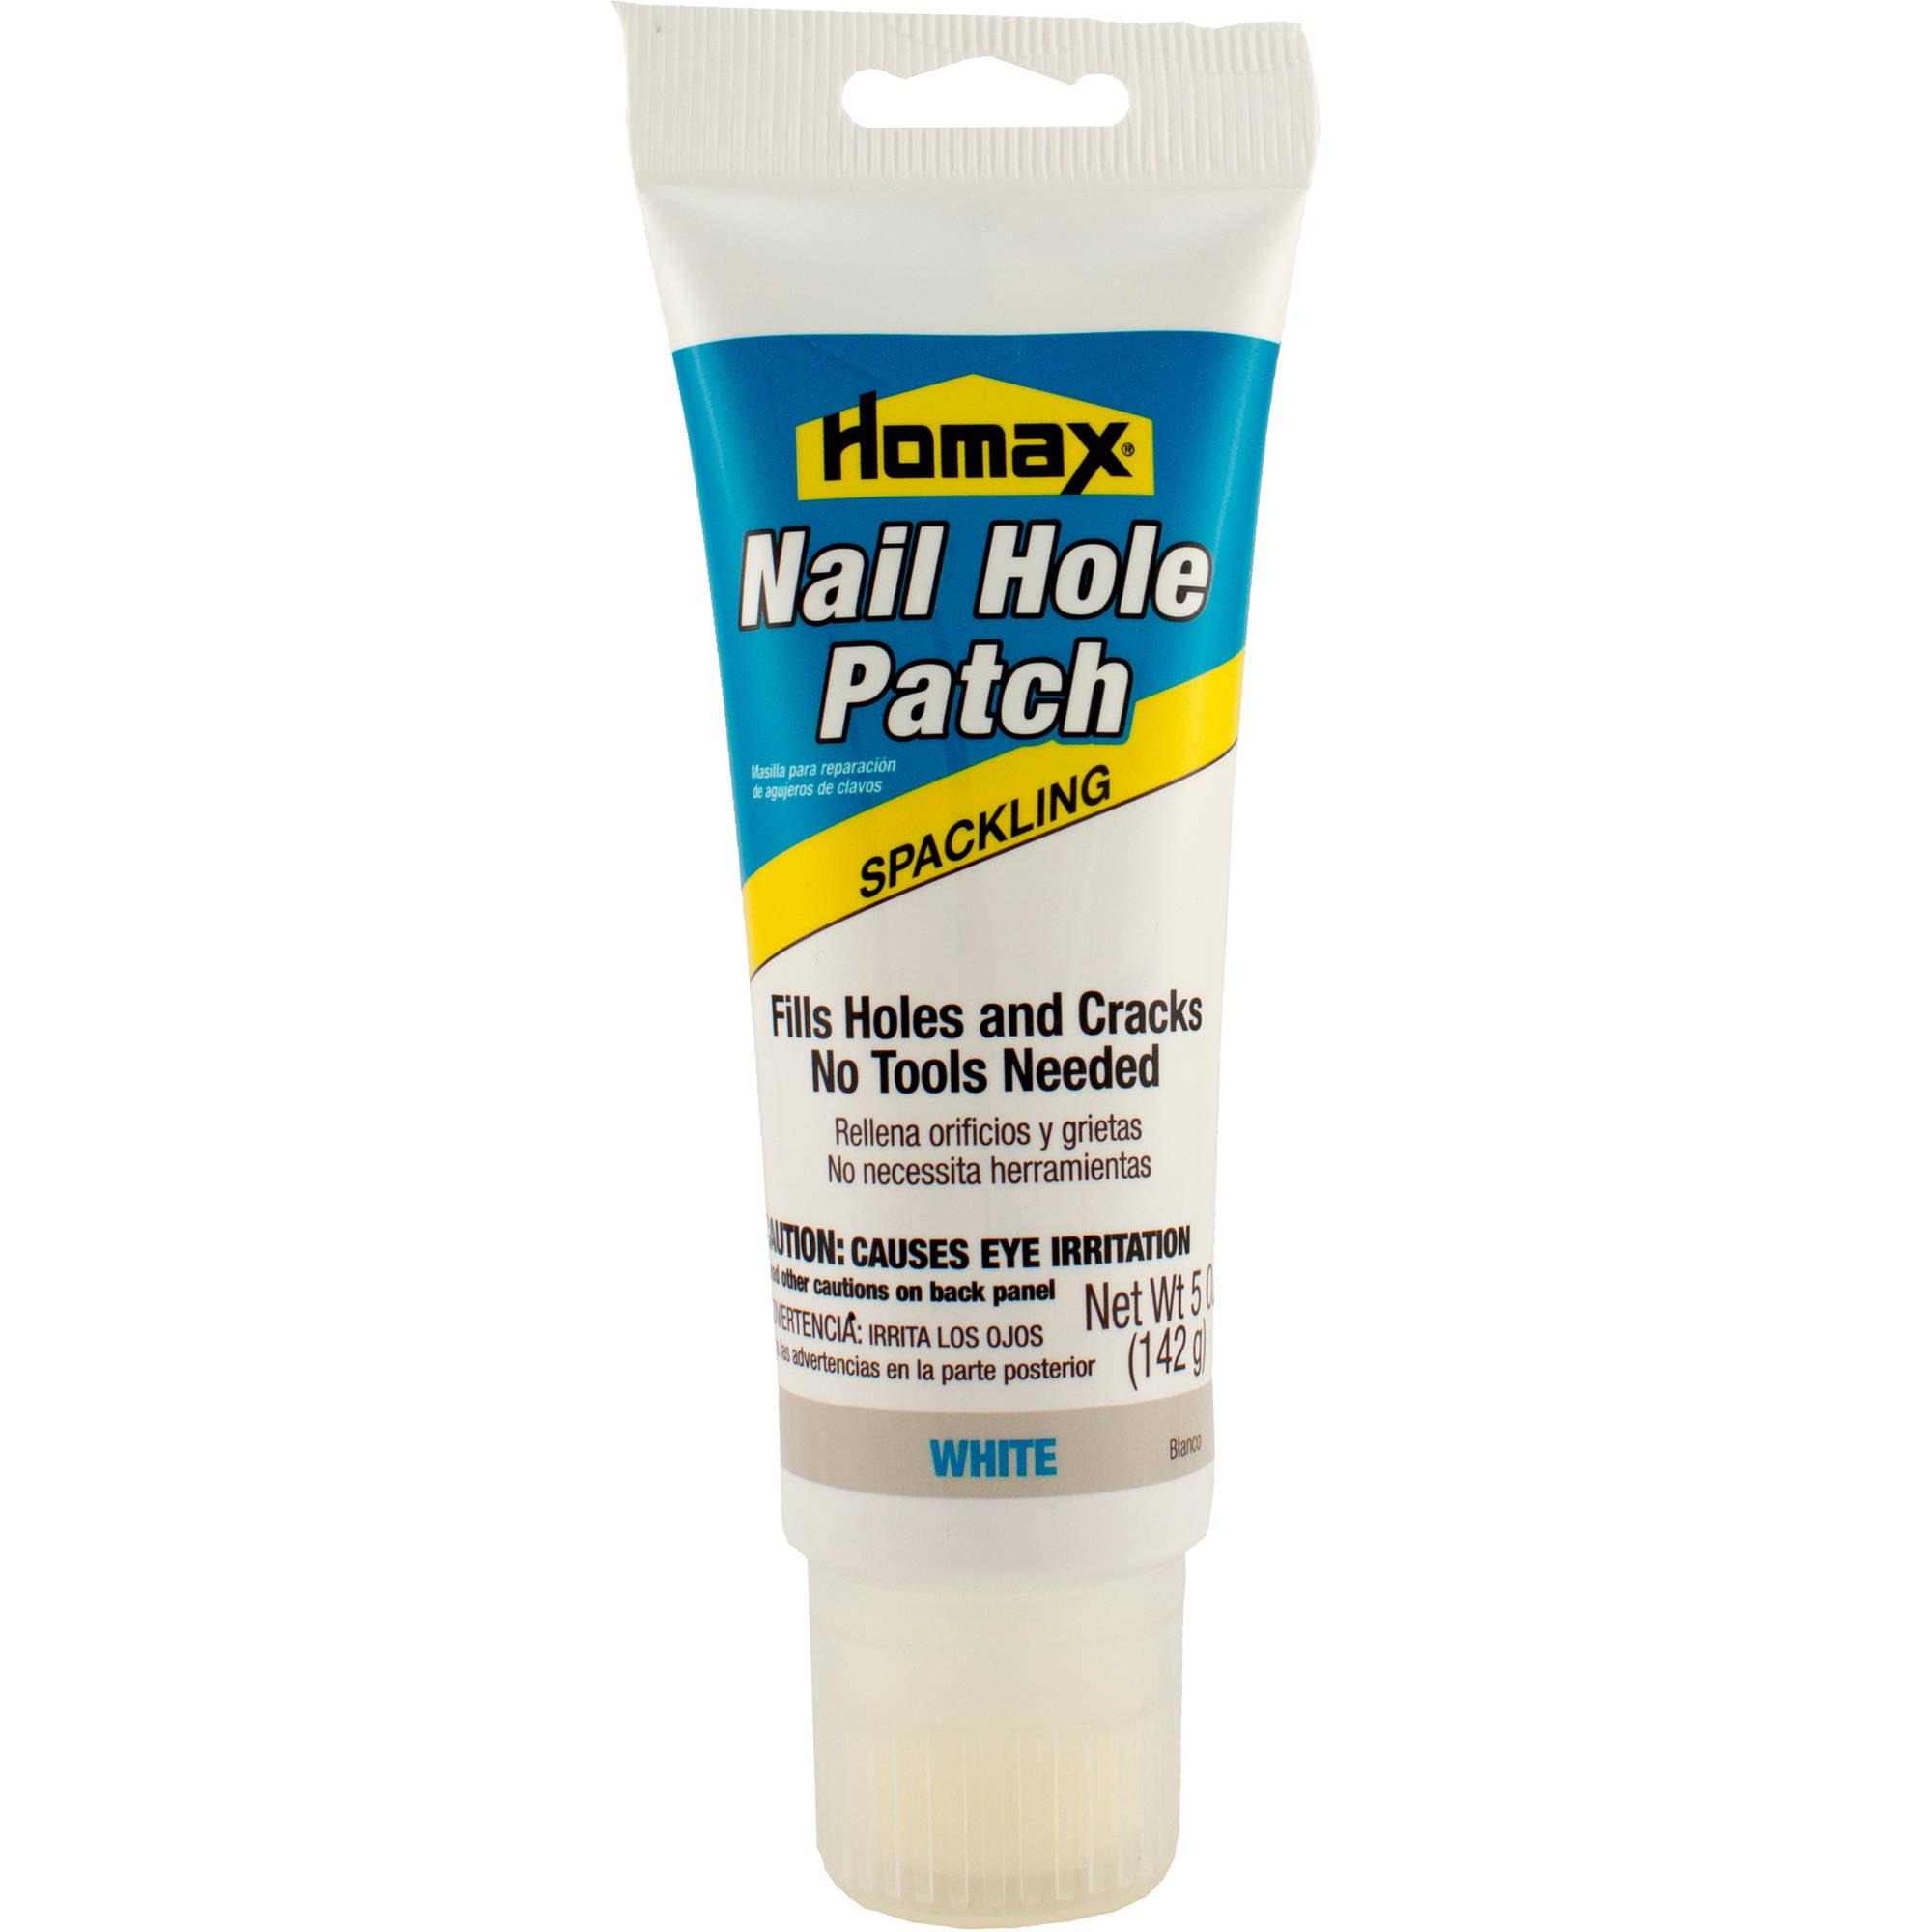 patching plaster walls nail holes